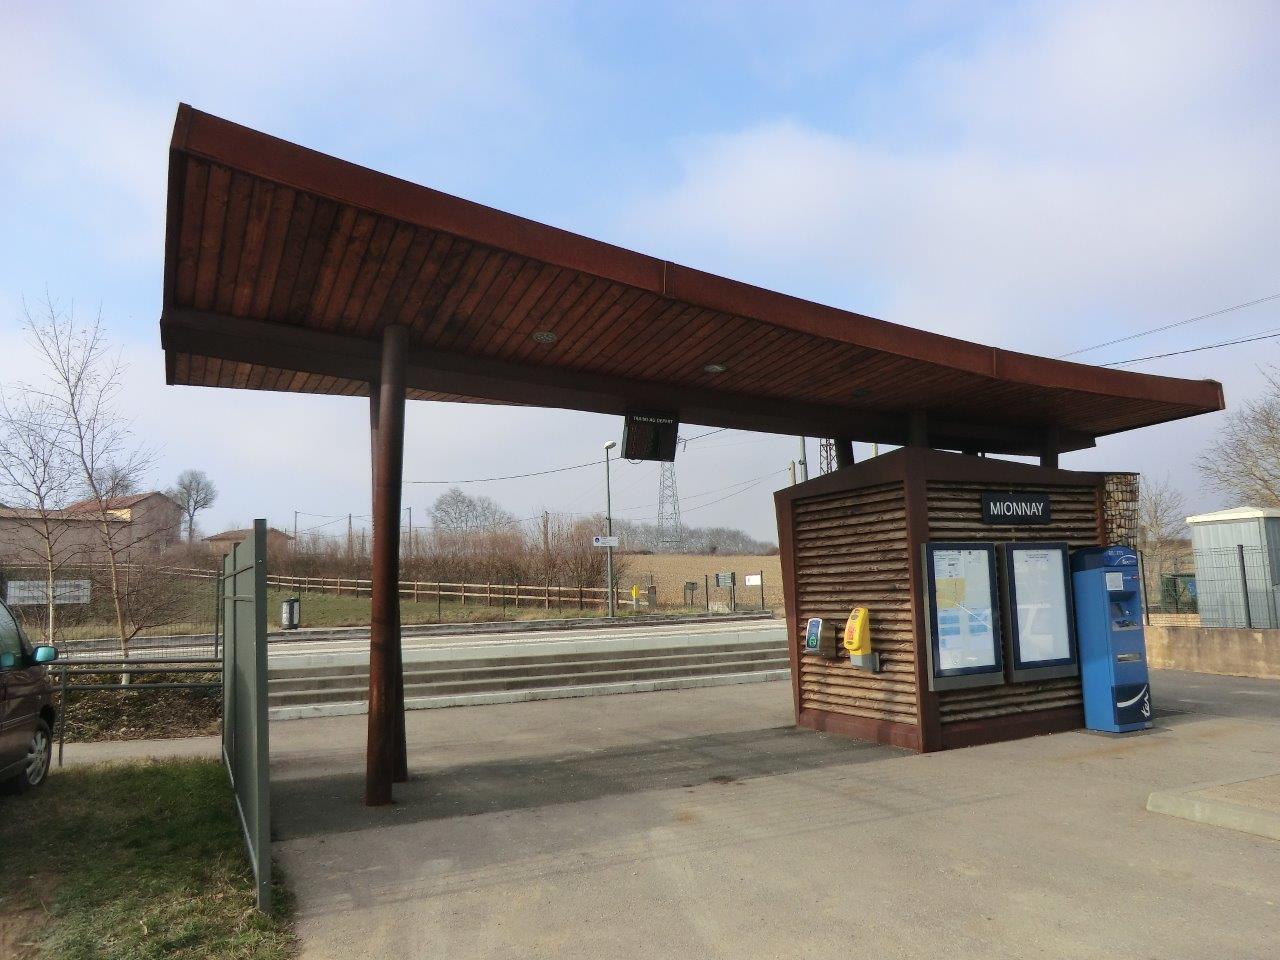 gare-de-mionnay-train-station